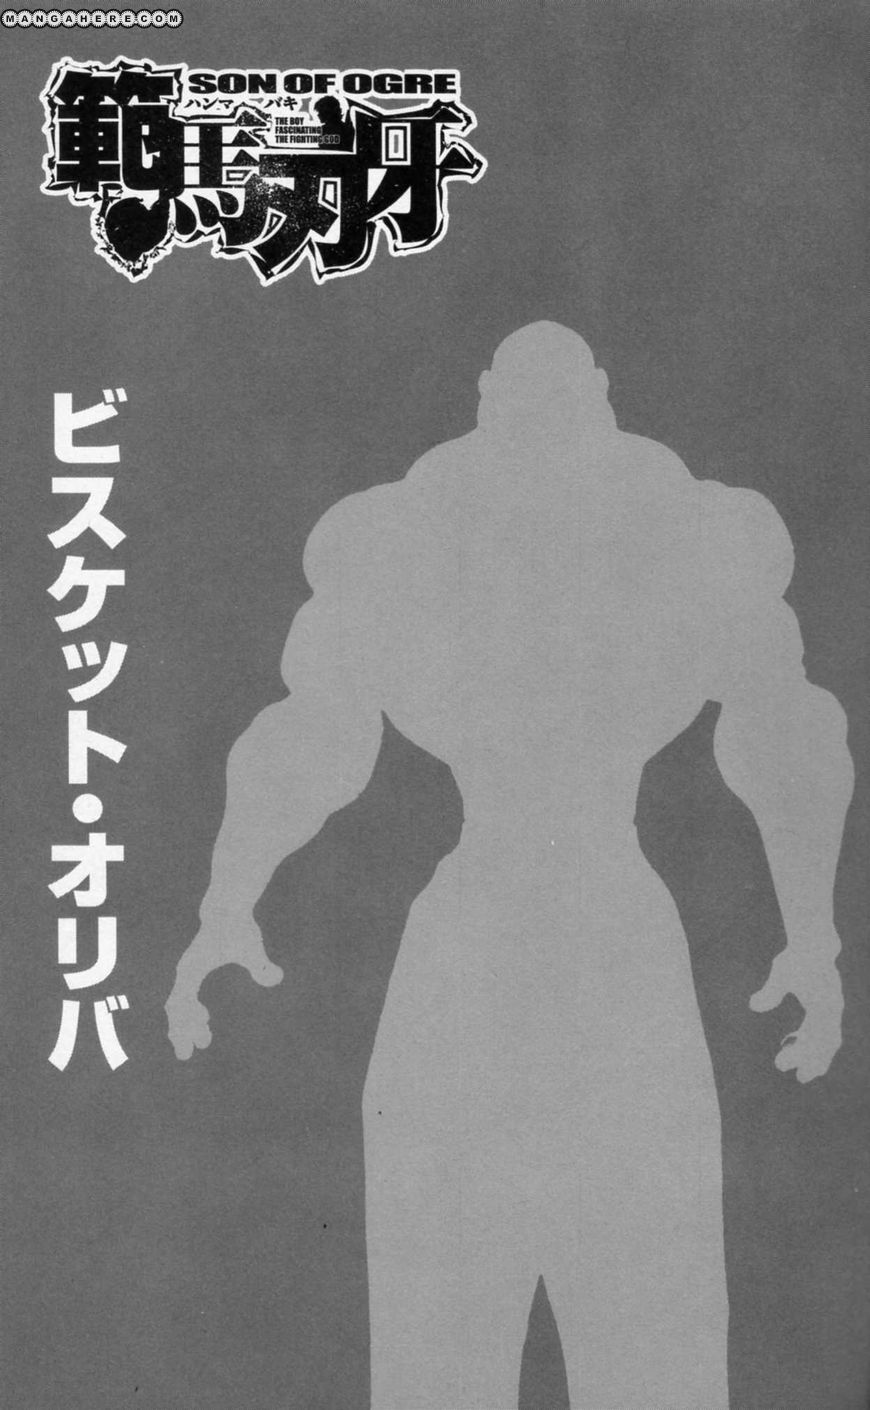 Baki - Son Of Ogre 177 Page 2